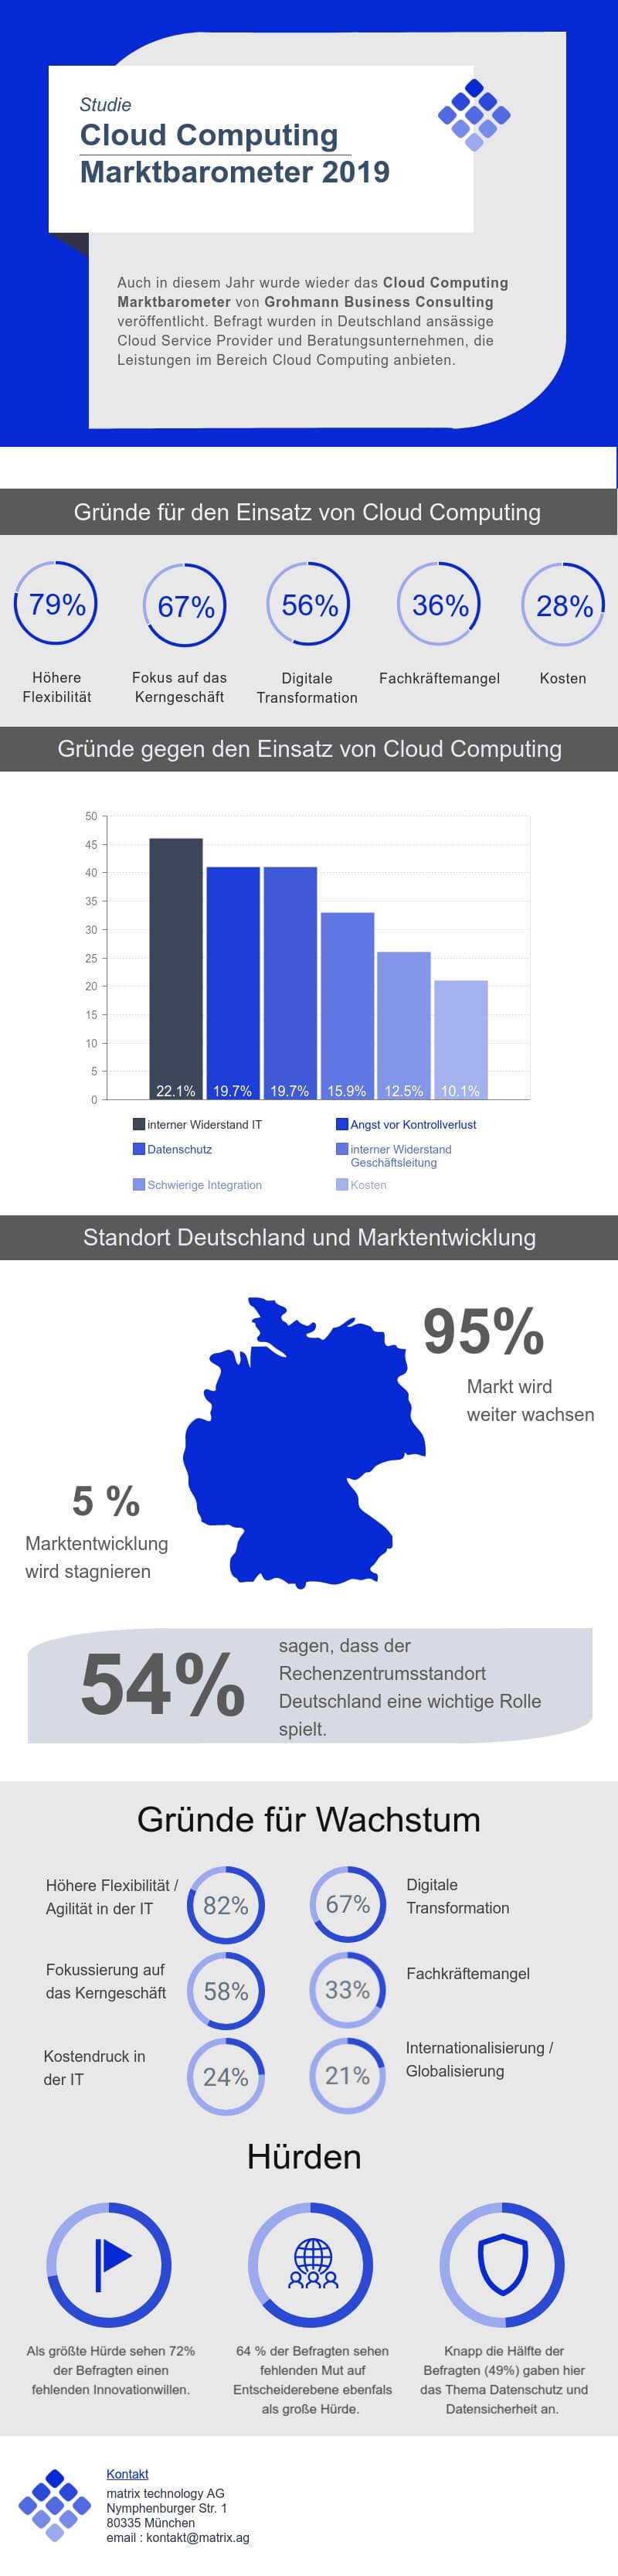 20190605_infografik-cc-marktbarometer-2019.jpg